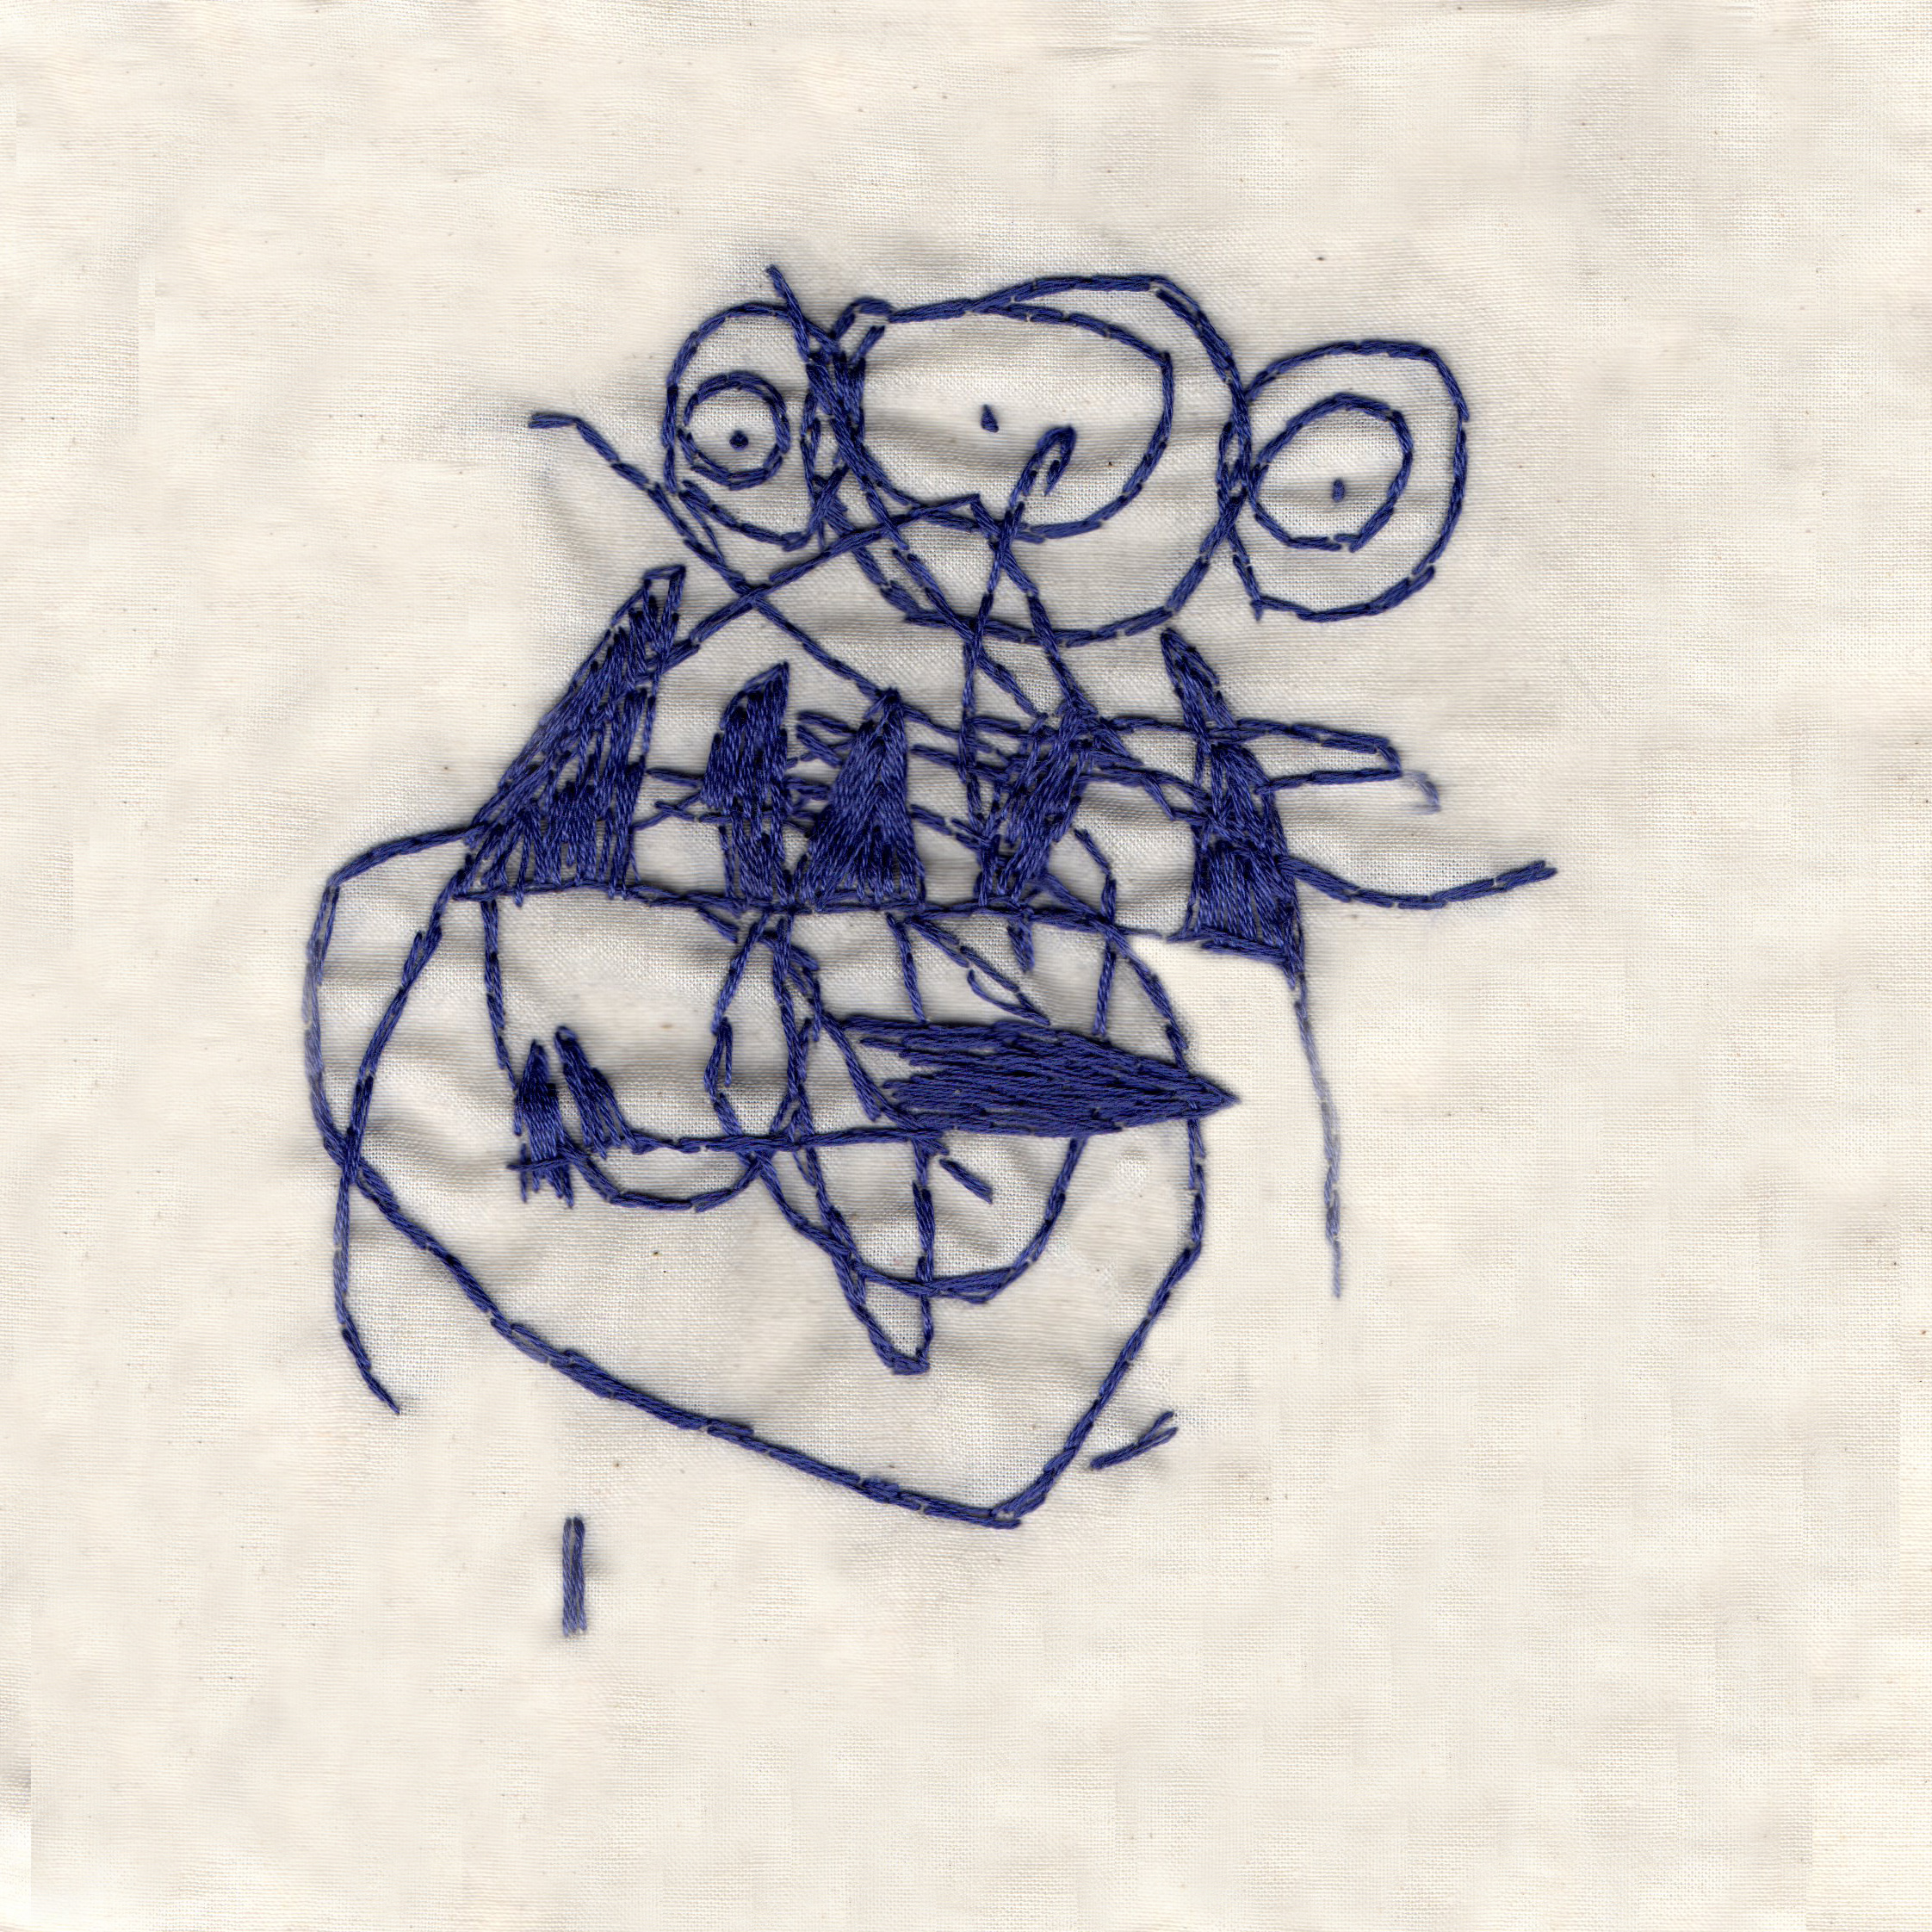 Three Eyed Punks (stitch)